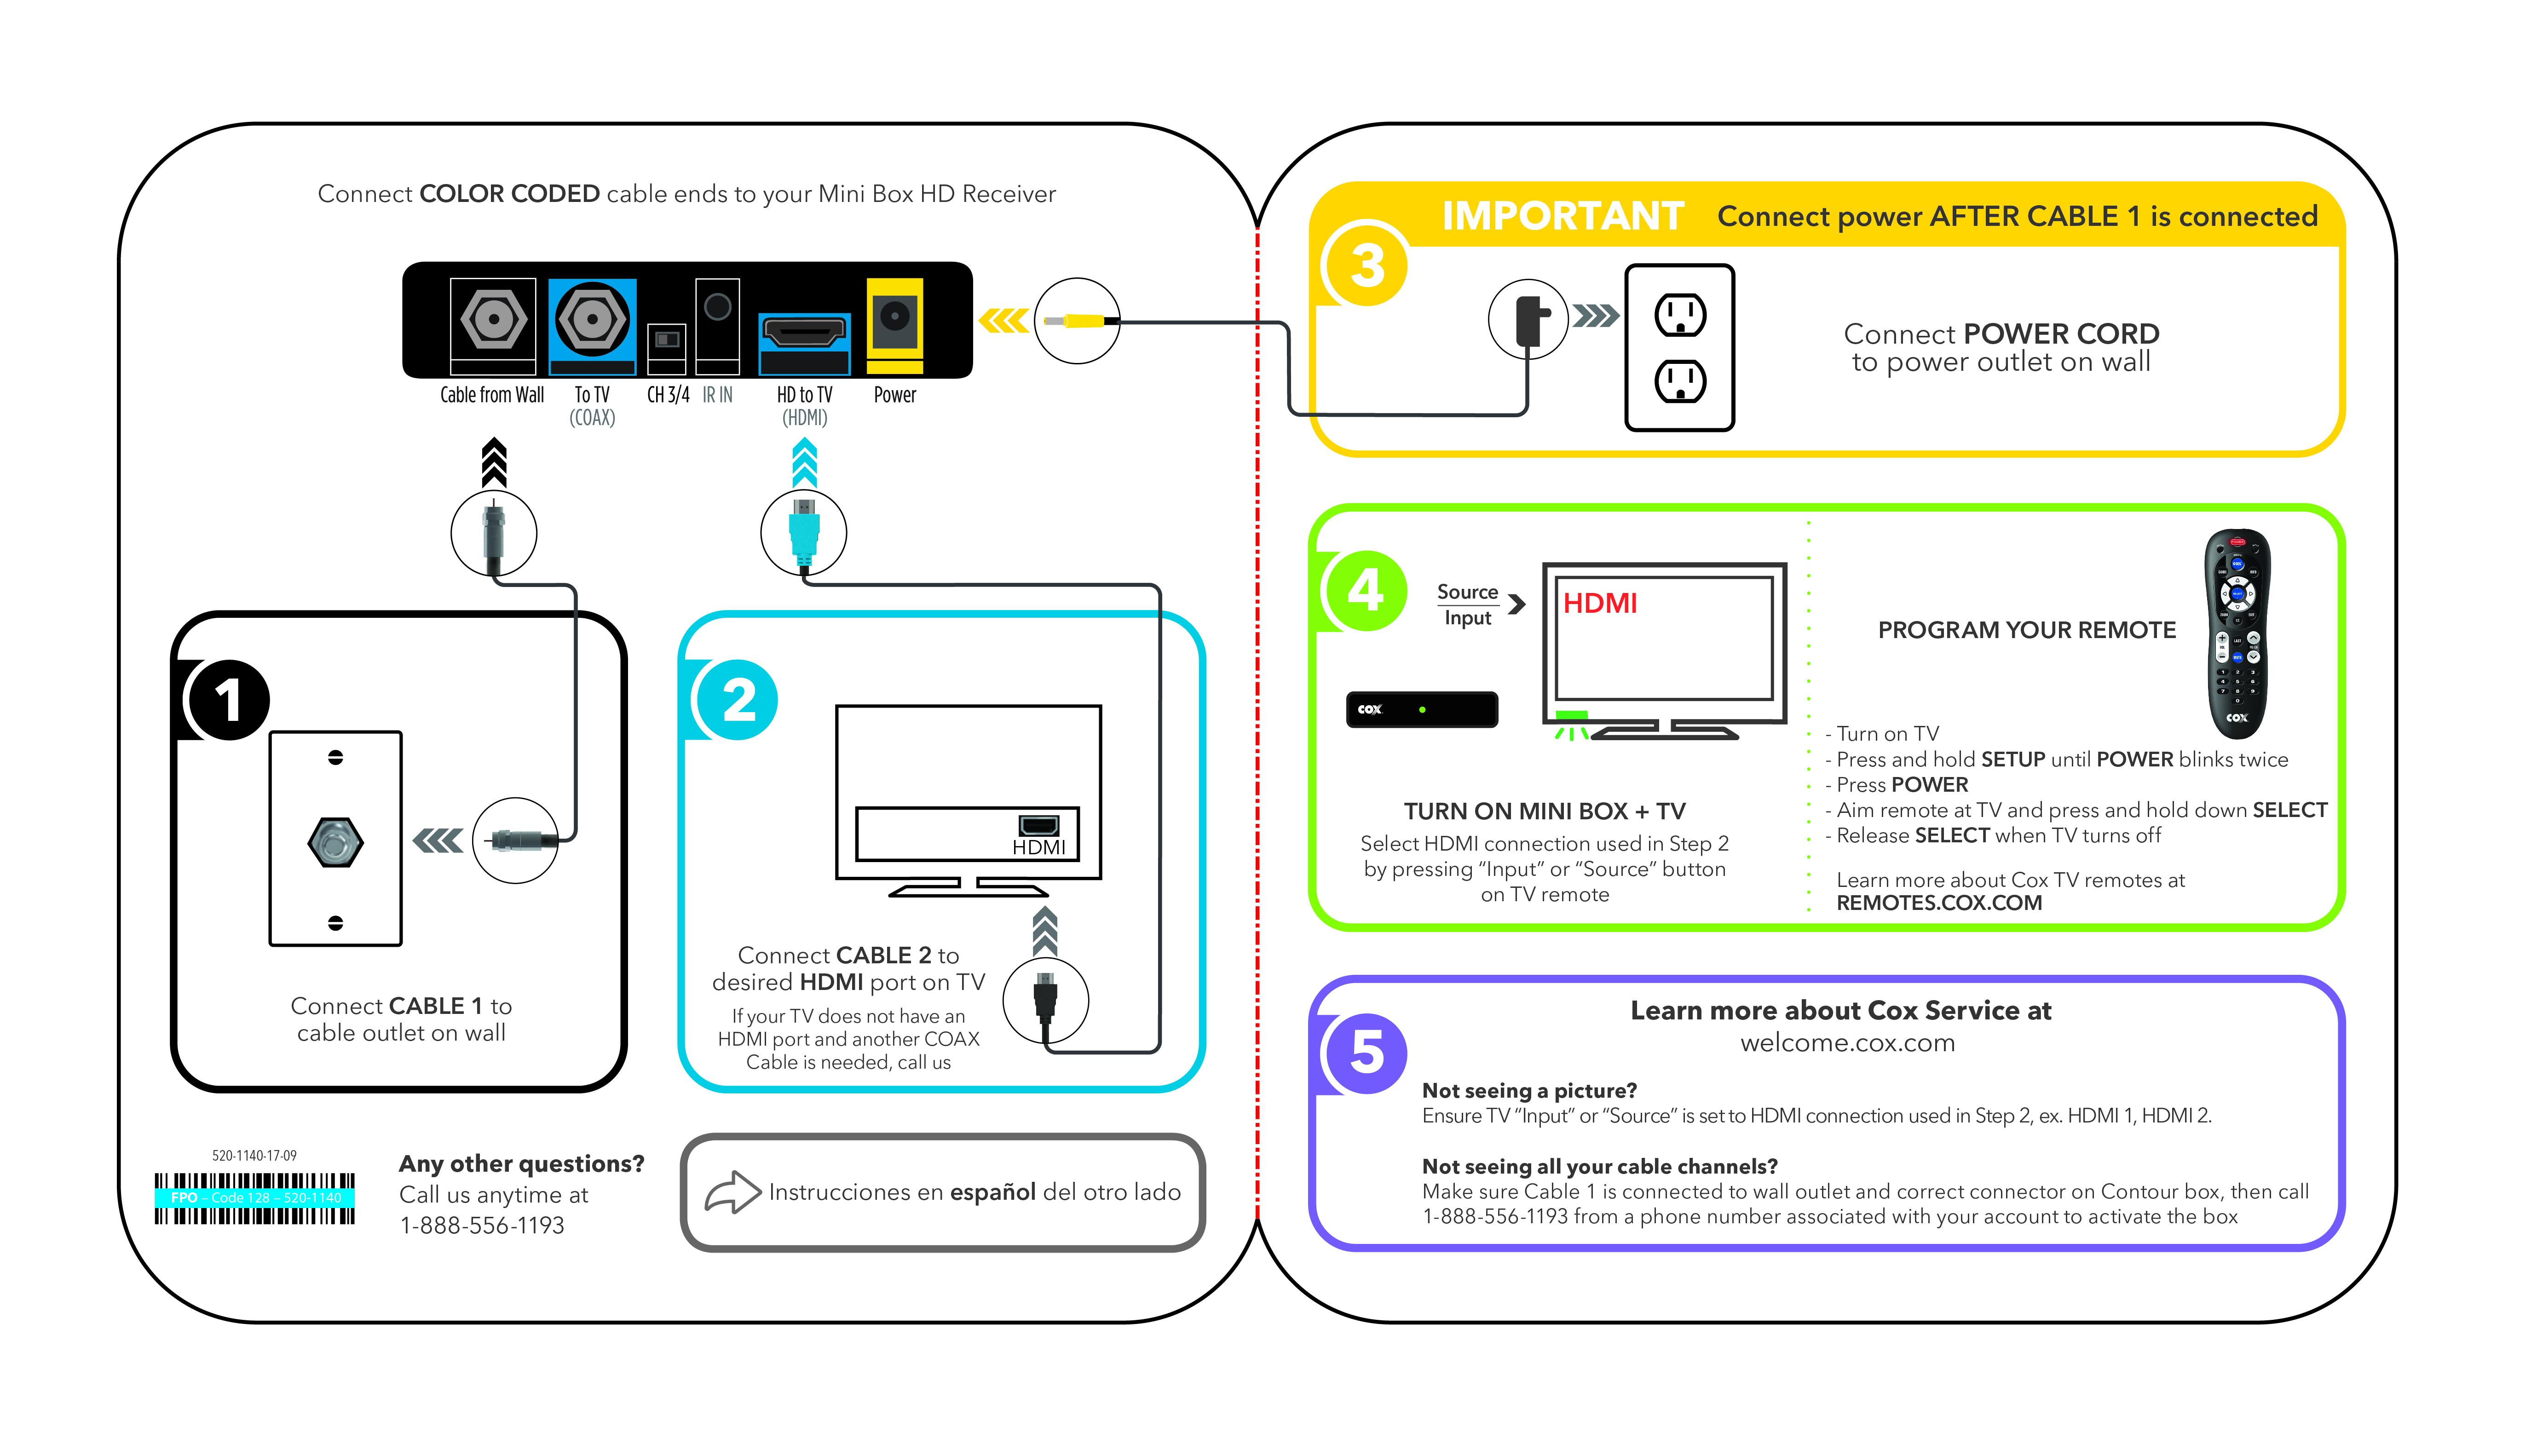 Swell Cox Self Installation Kits And User Guides Wiring Cloud Ittabisraaidewilluminateatxorg